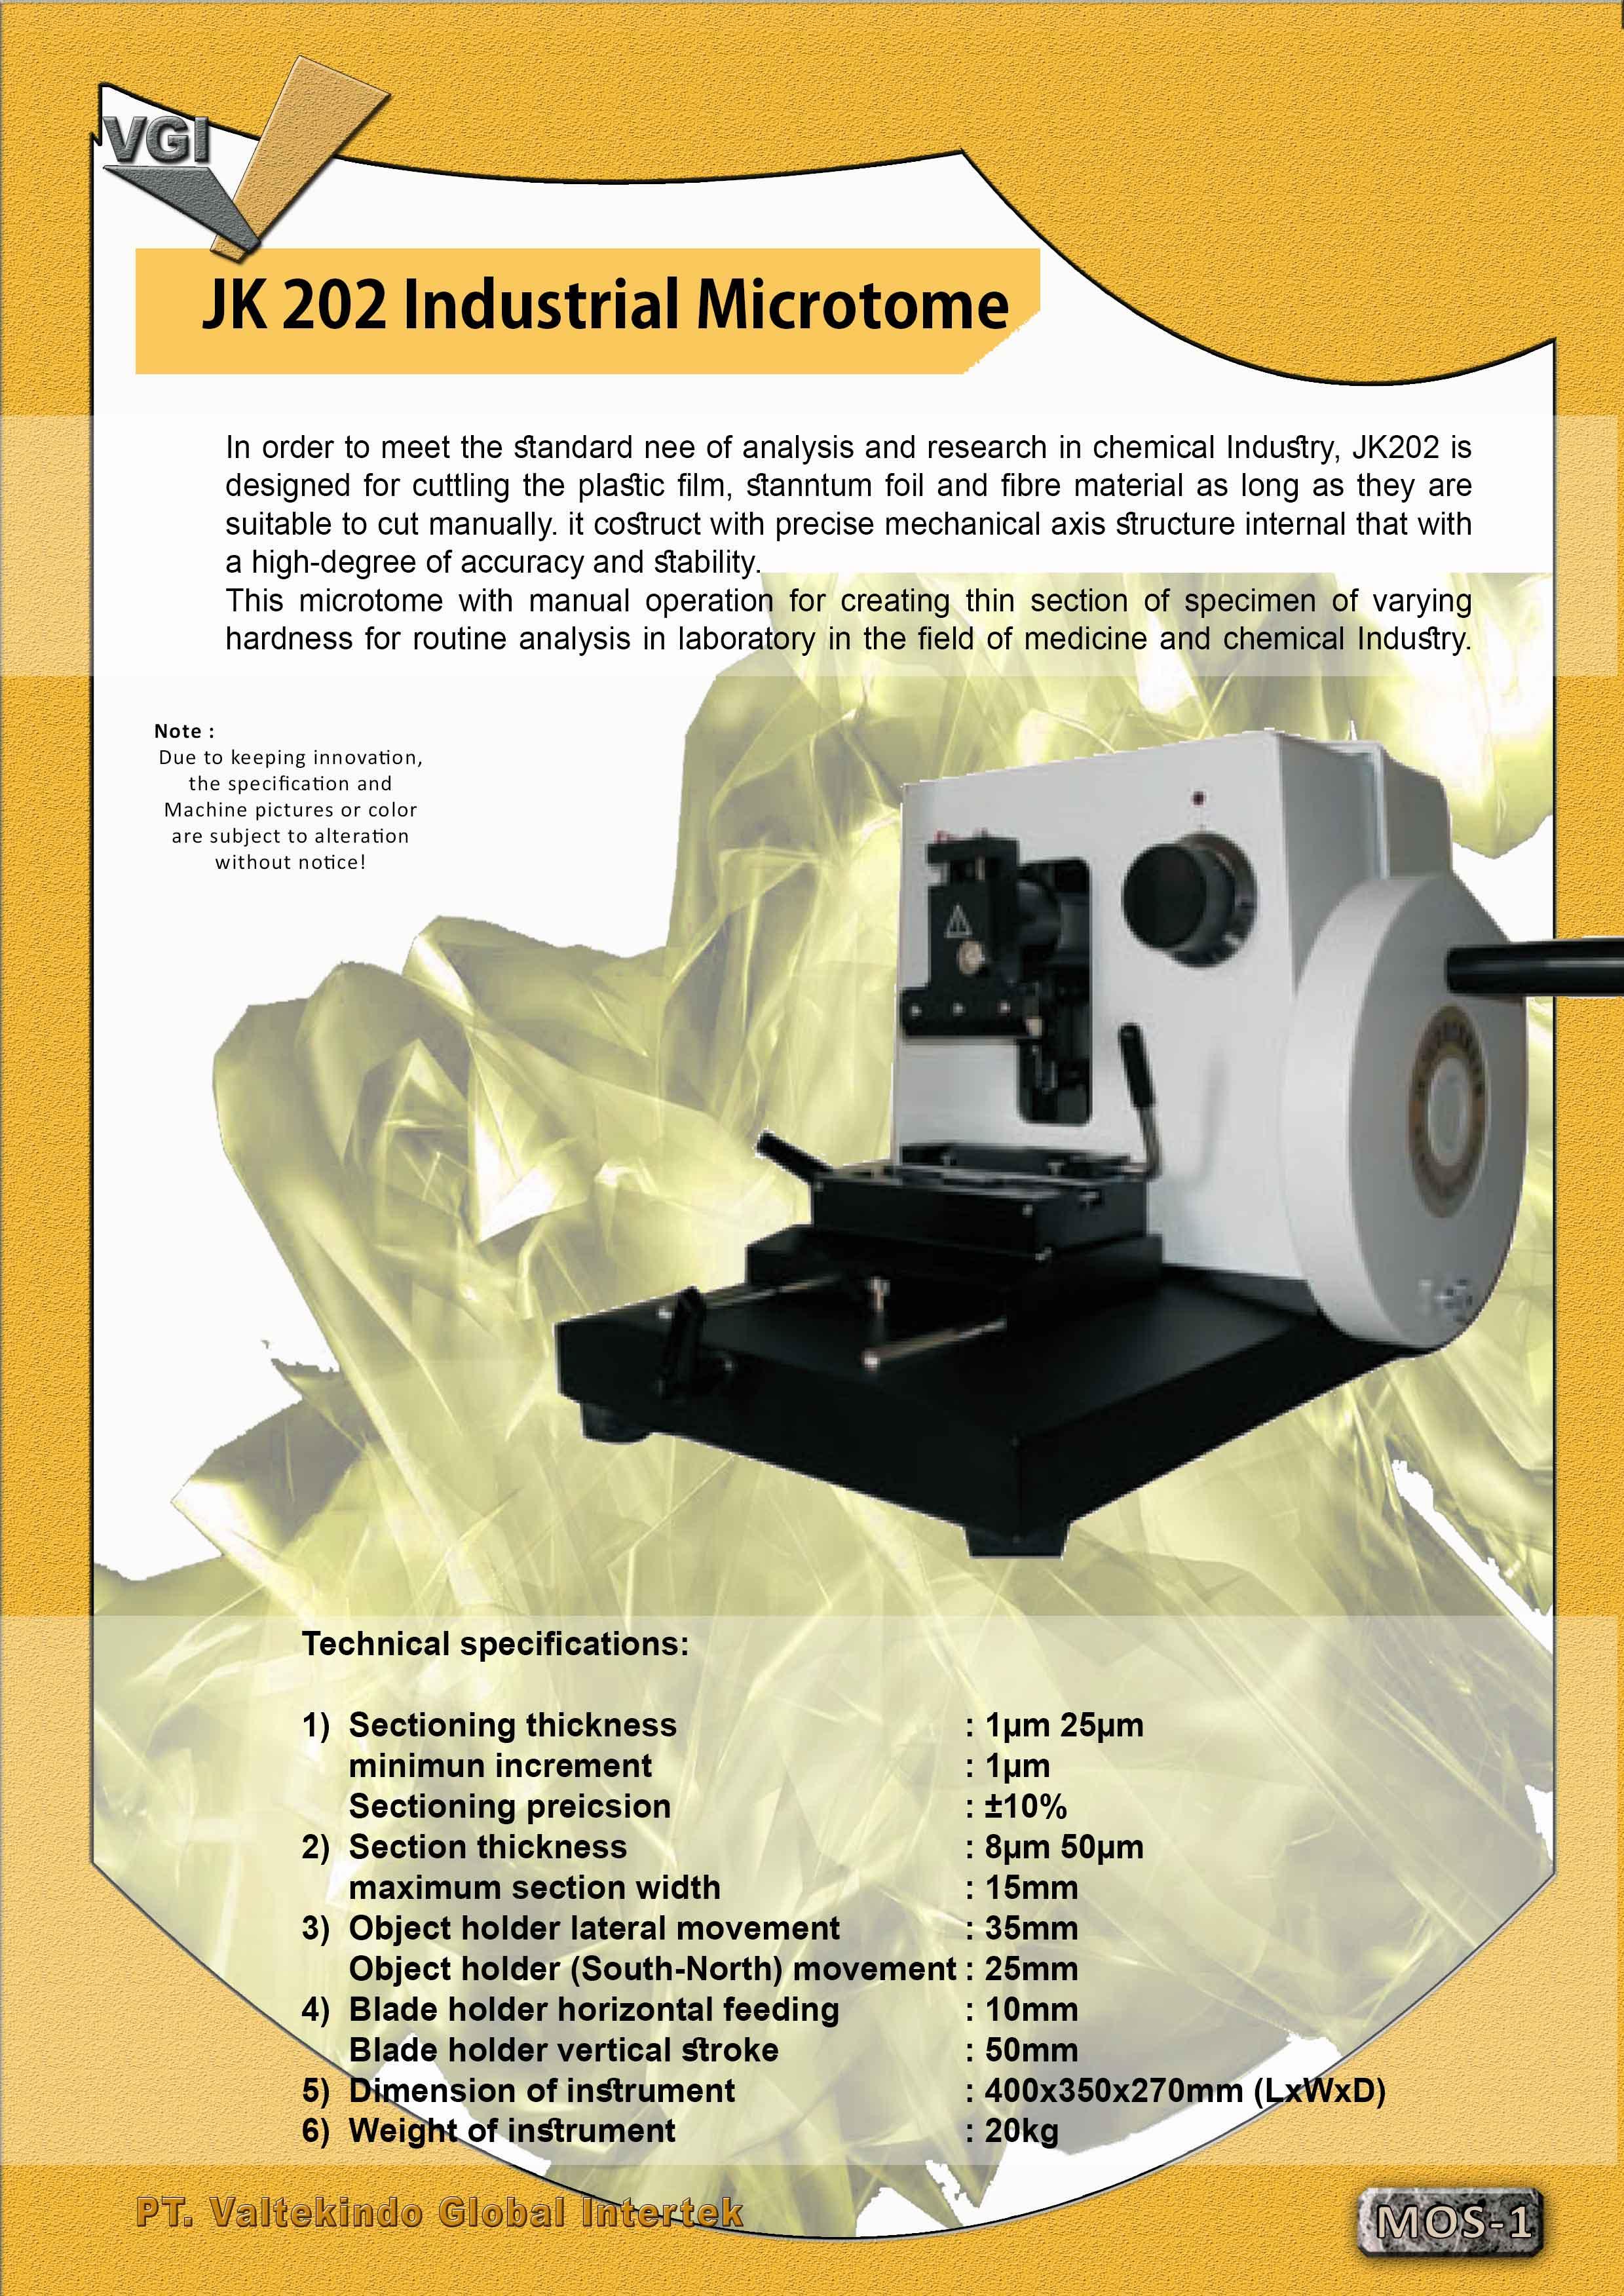 jual mesin, harga mesin, jual mesin bandung, distributor mesin, jual mesin karet, daur ulang karet, daur ulang plastik, mesin pertanian Industrial Microtome Industrial Microtome